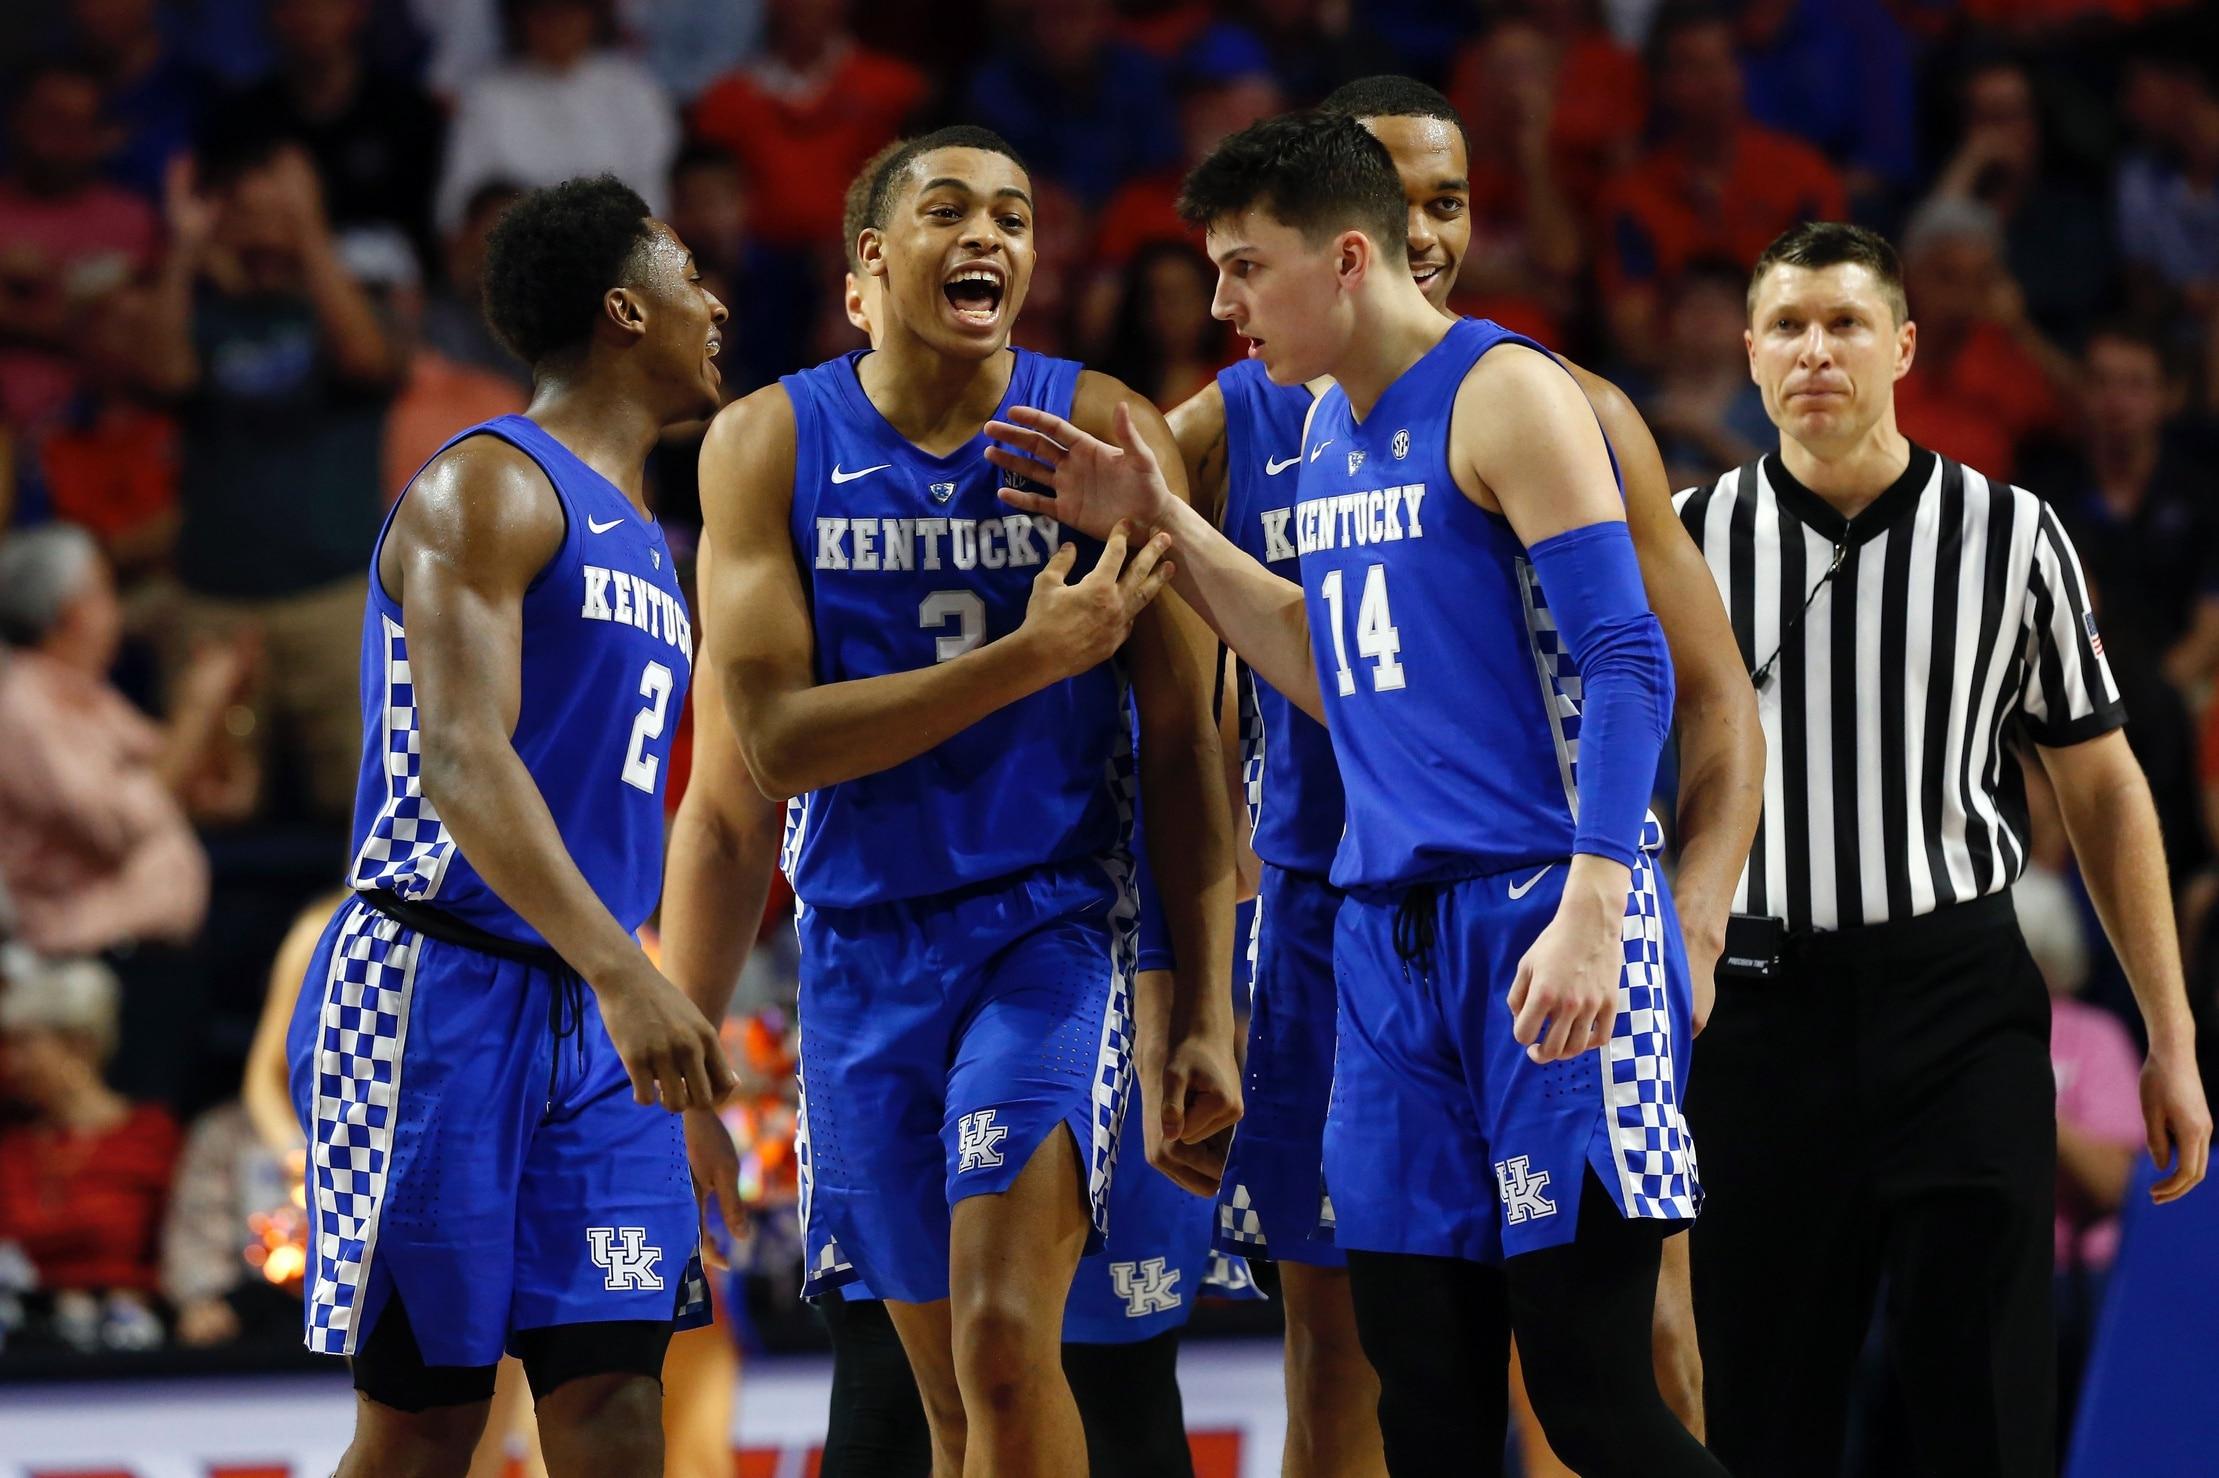 super popular 991ca 467cb NBA Draft: Tyler Herro, Keldon Johnson, and PJ Washington's top NCAA  tournament highlights